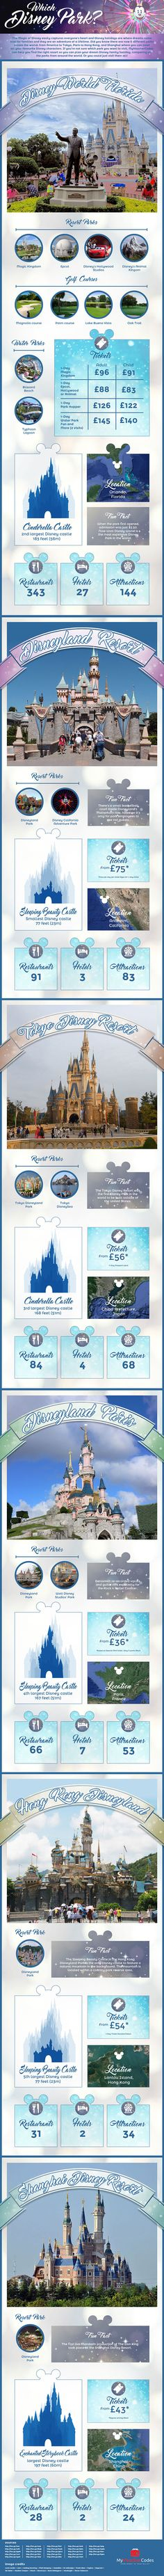 Disney-Web-Info